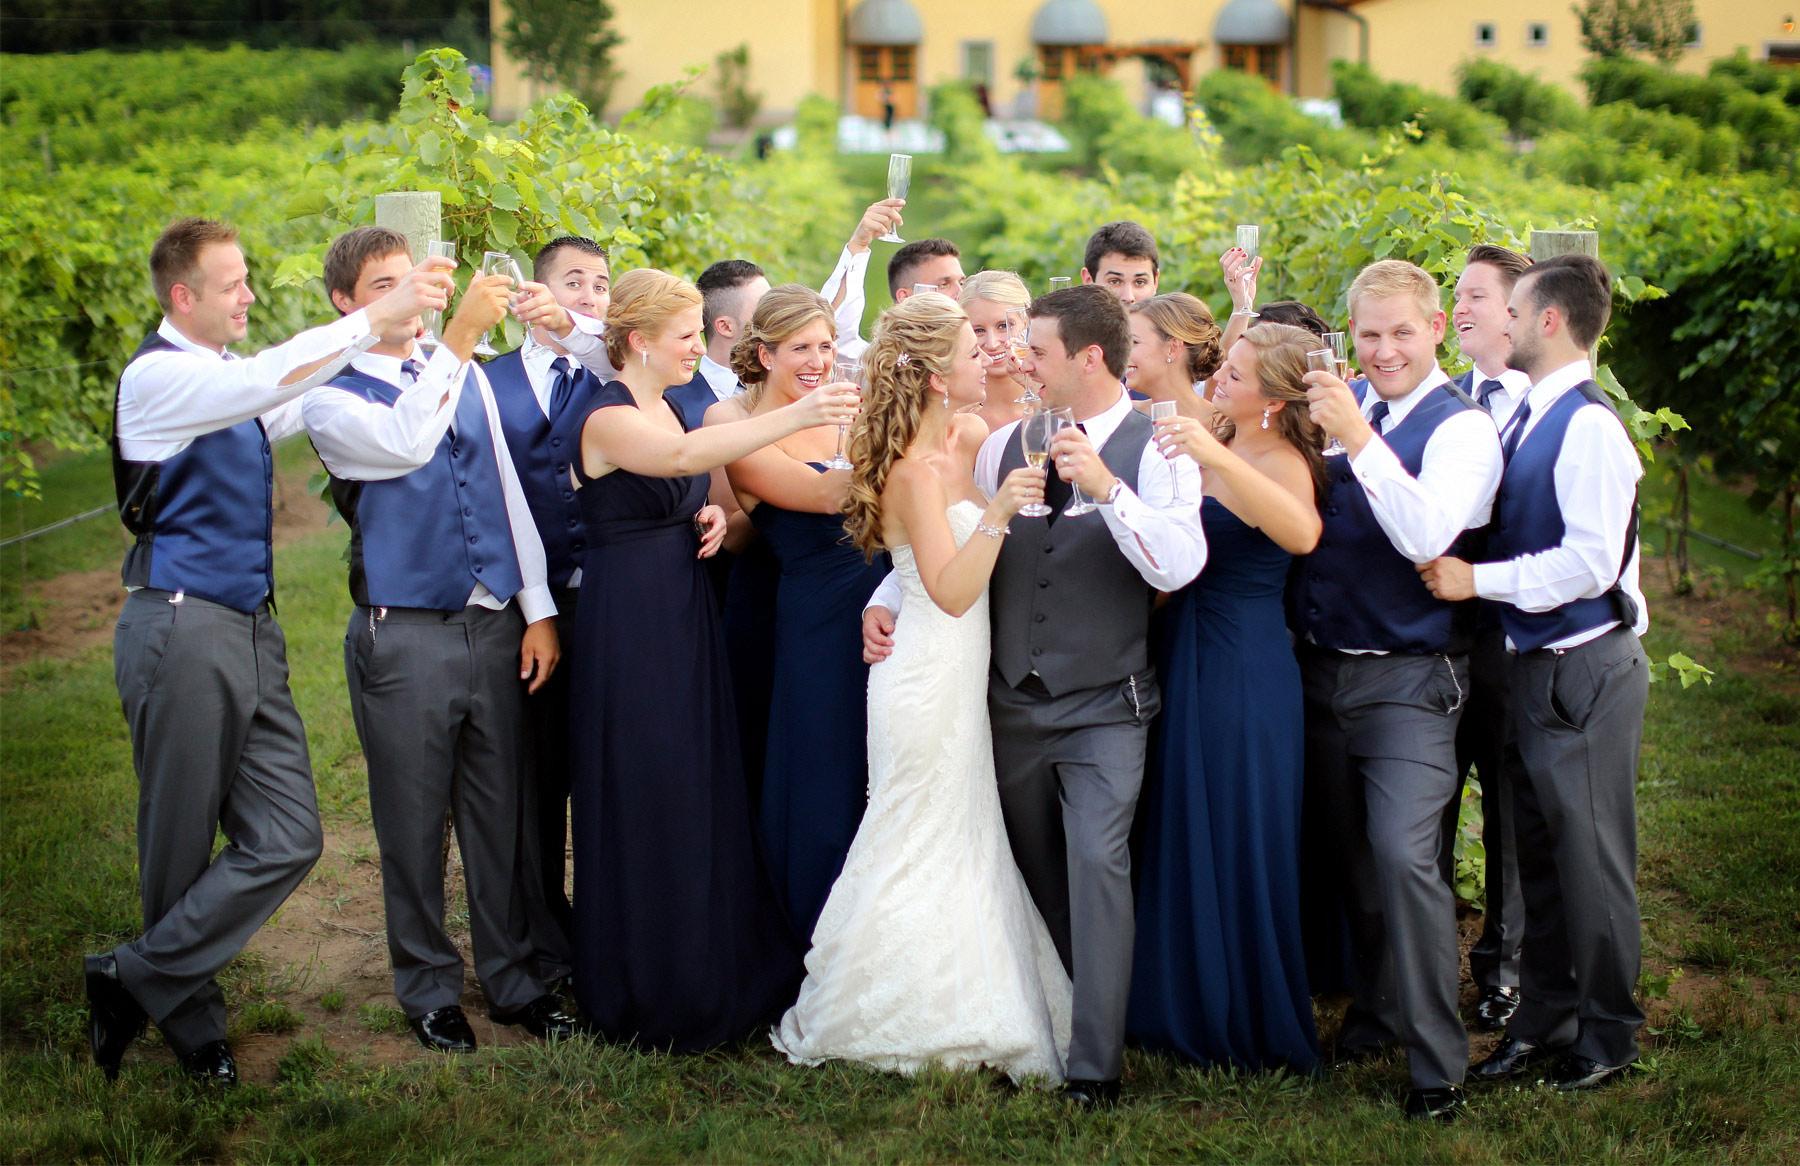 12-Lake-Pepin-Wisconsin-Wedding-Photography-by-Vick-Photography-Villa-Bellezza-Vineyard-Winery-Toasting-Wedding-Party-Emily-&-Sam.jpg